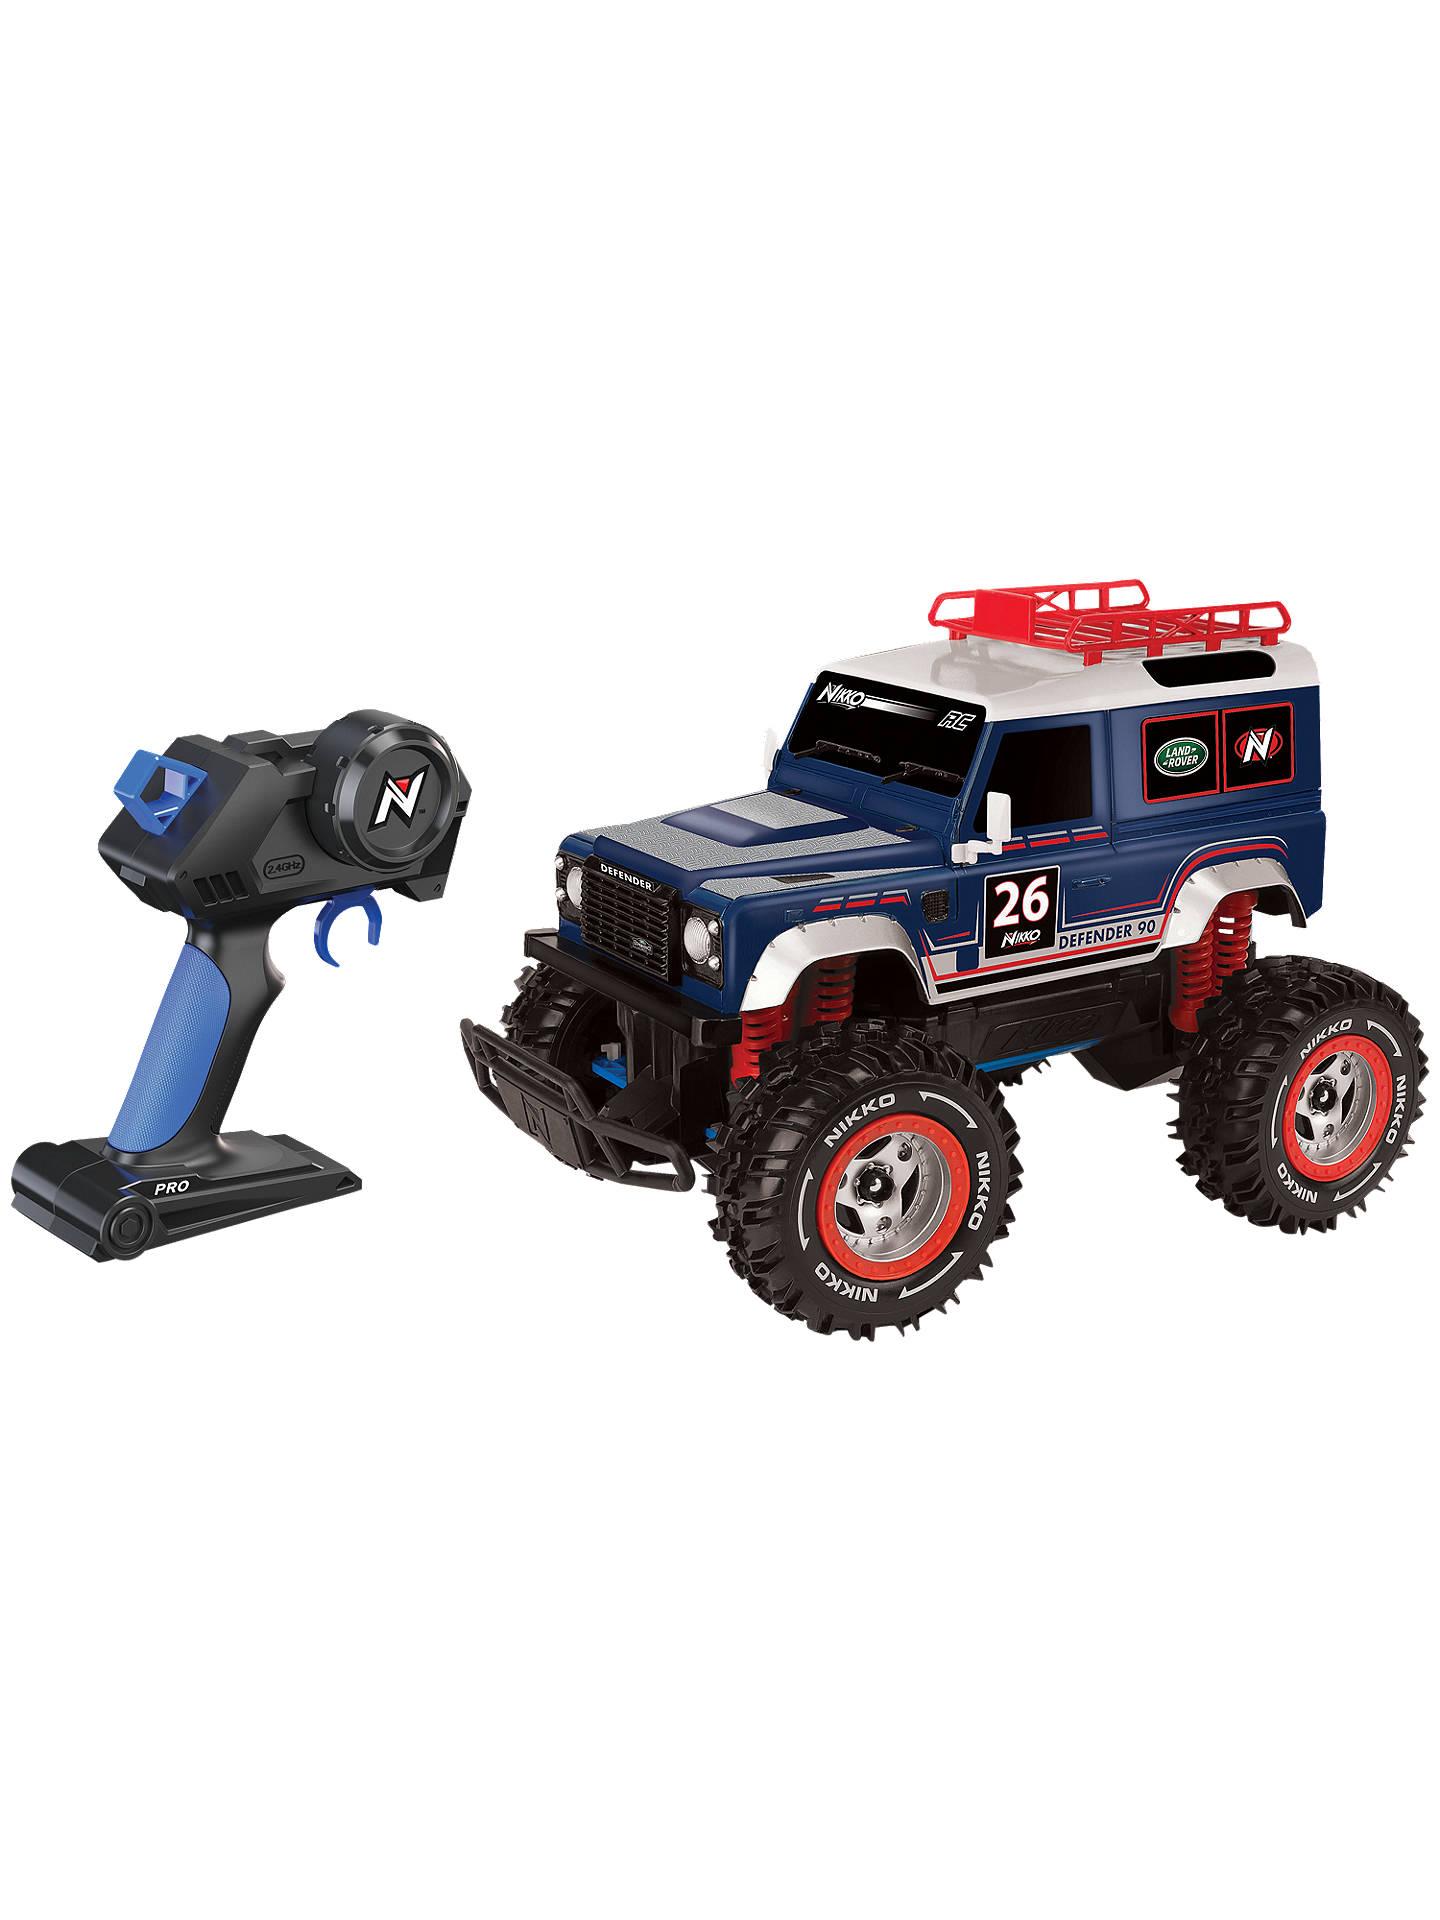 Nikko Land Rover Defender 90 Pro Remote Control Car At John Lewis